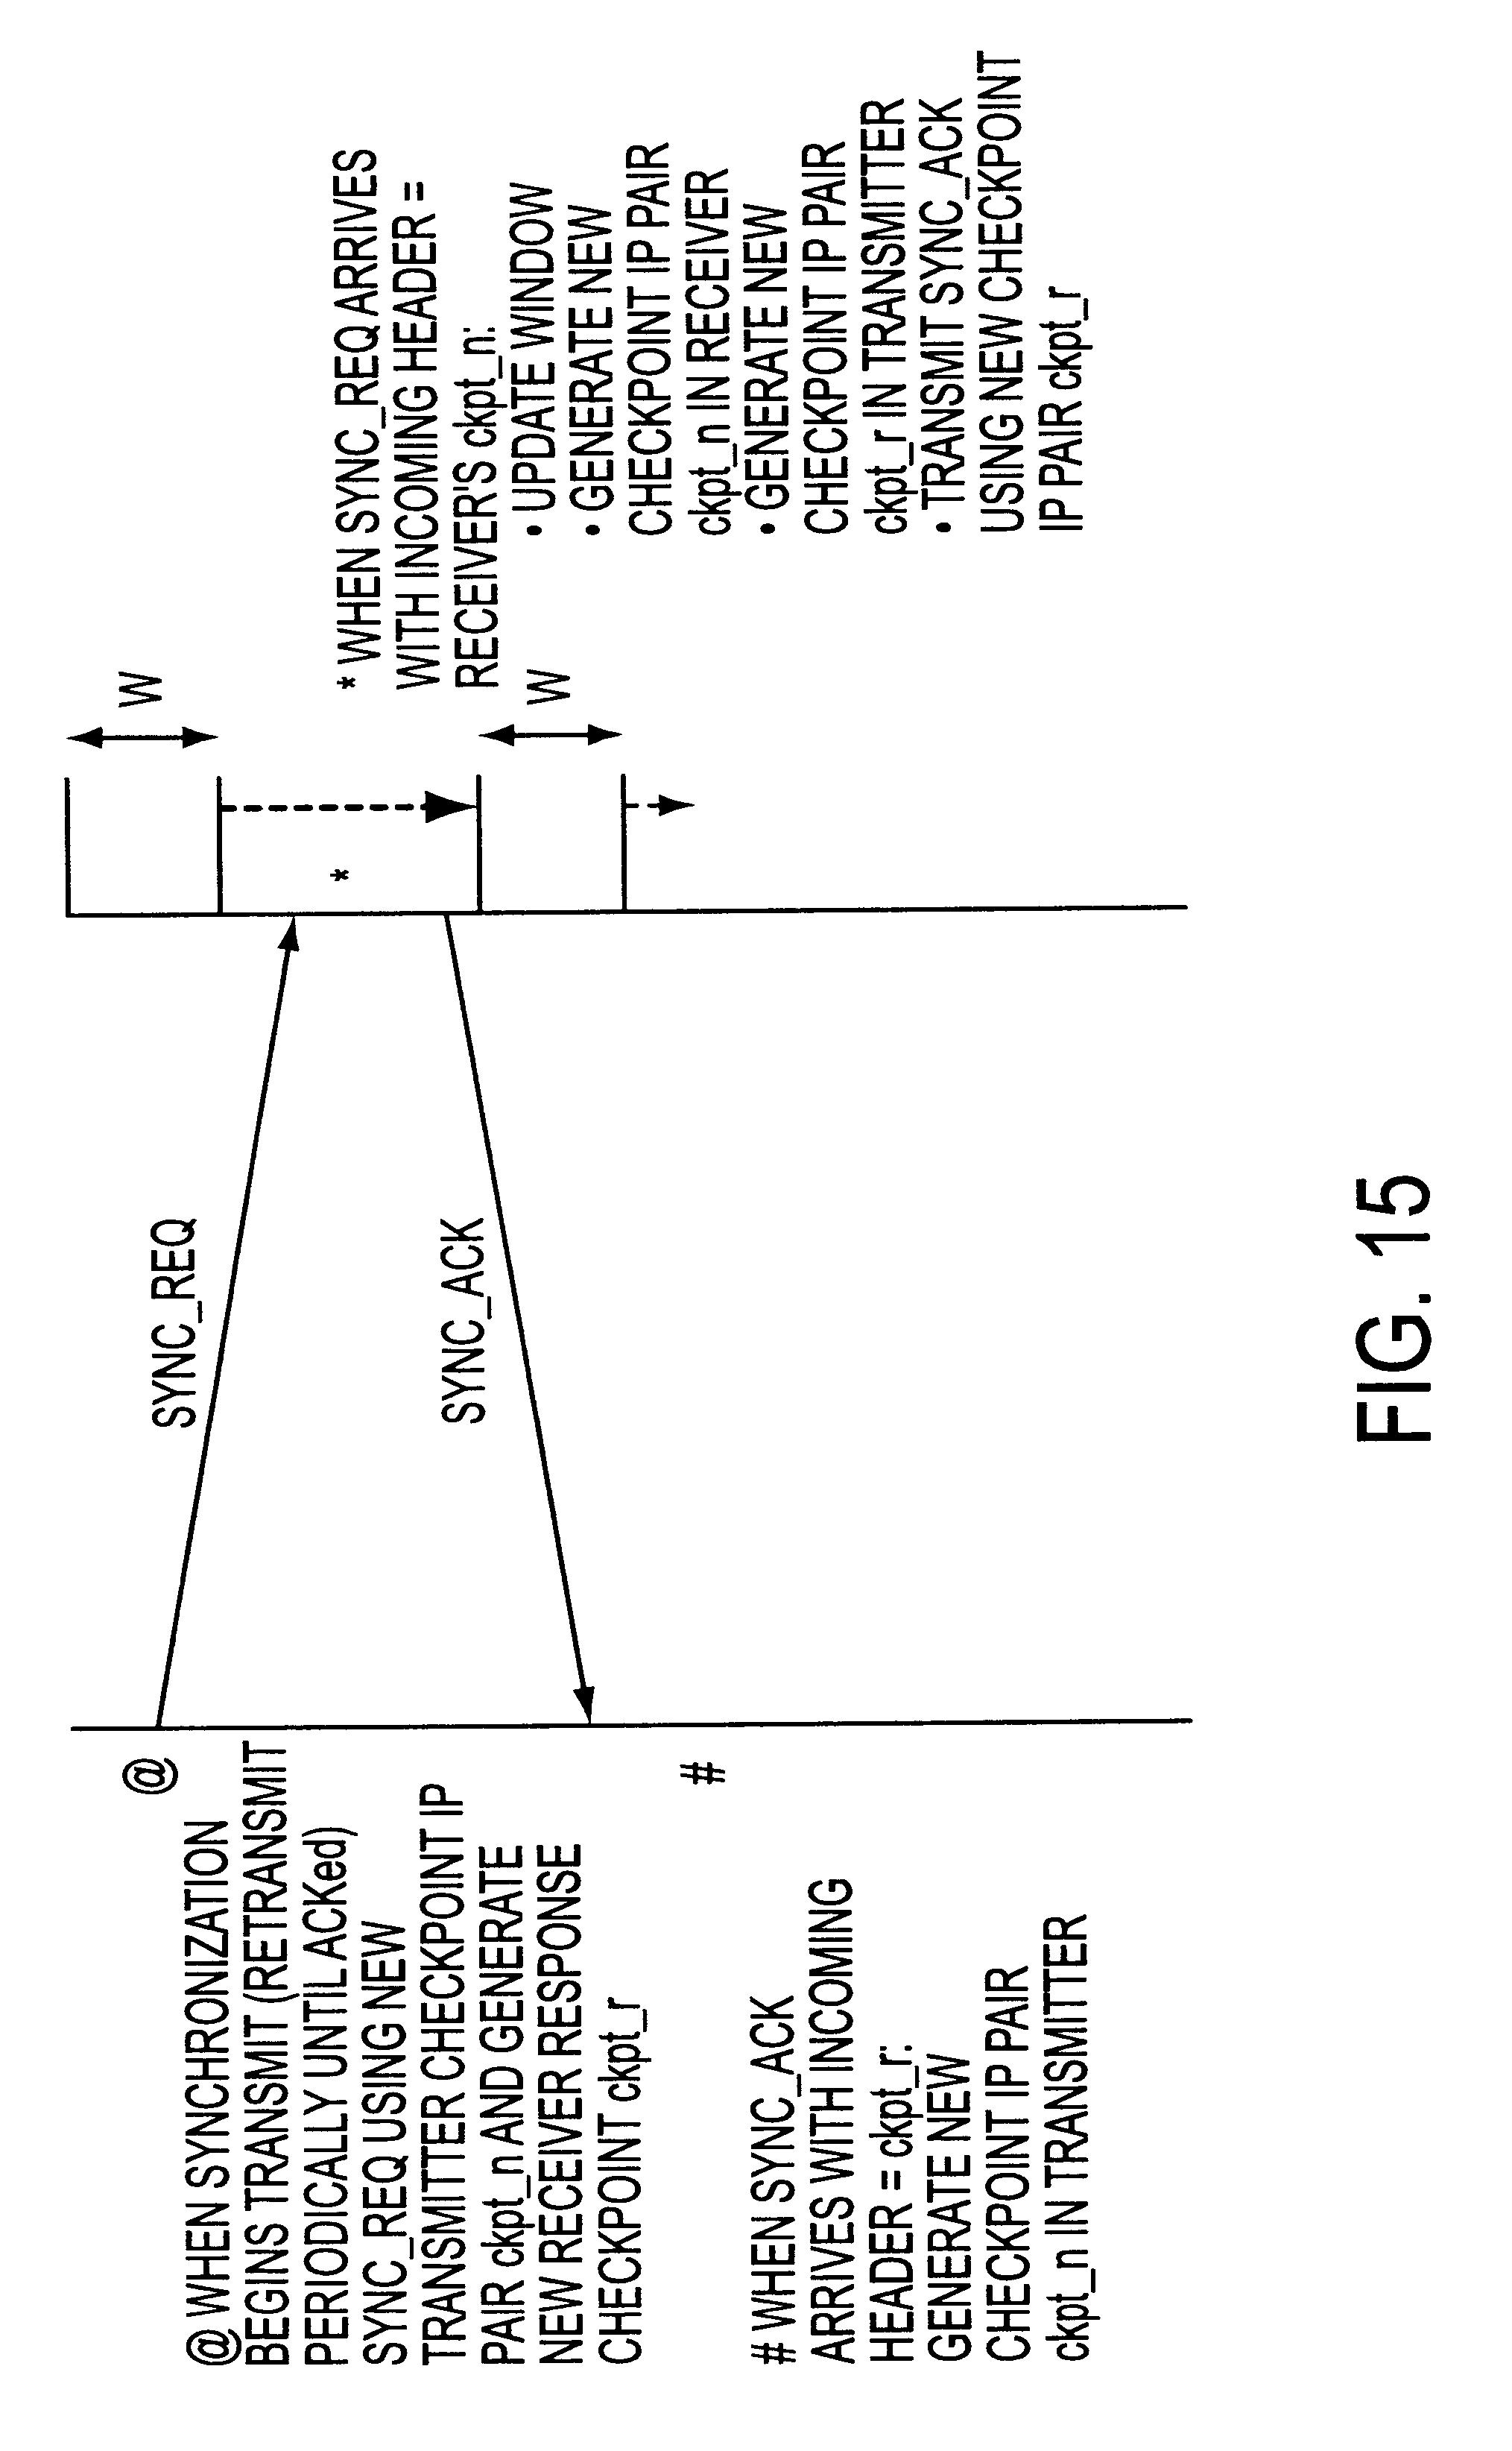 Patent US 6,618,761 B2